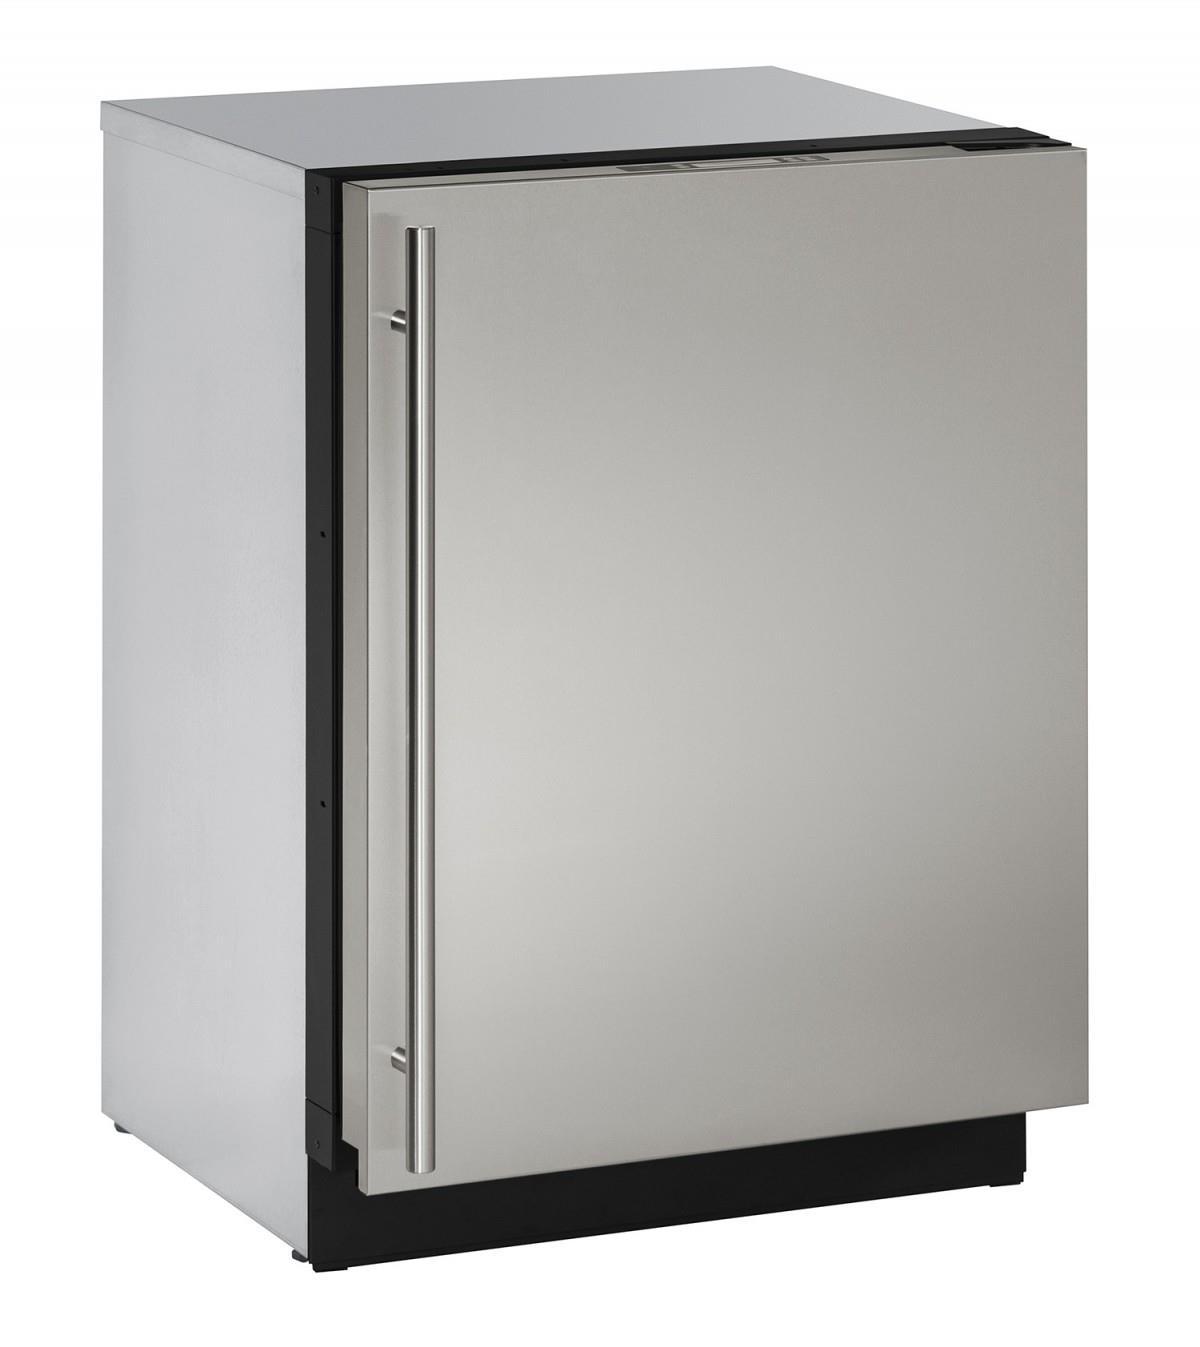 "U-Line Refrigerators 24"" Solid Door Compact Refrigerator - Item Number: U-3024RS-00A"